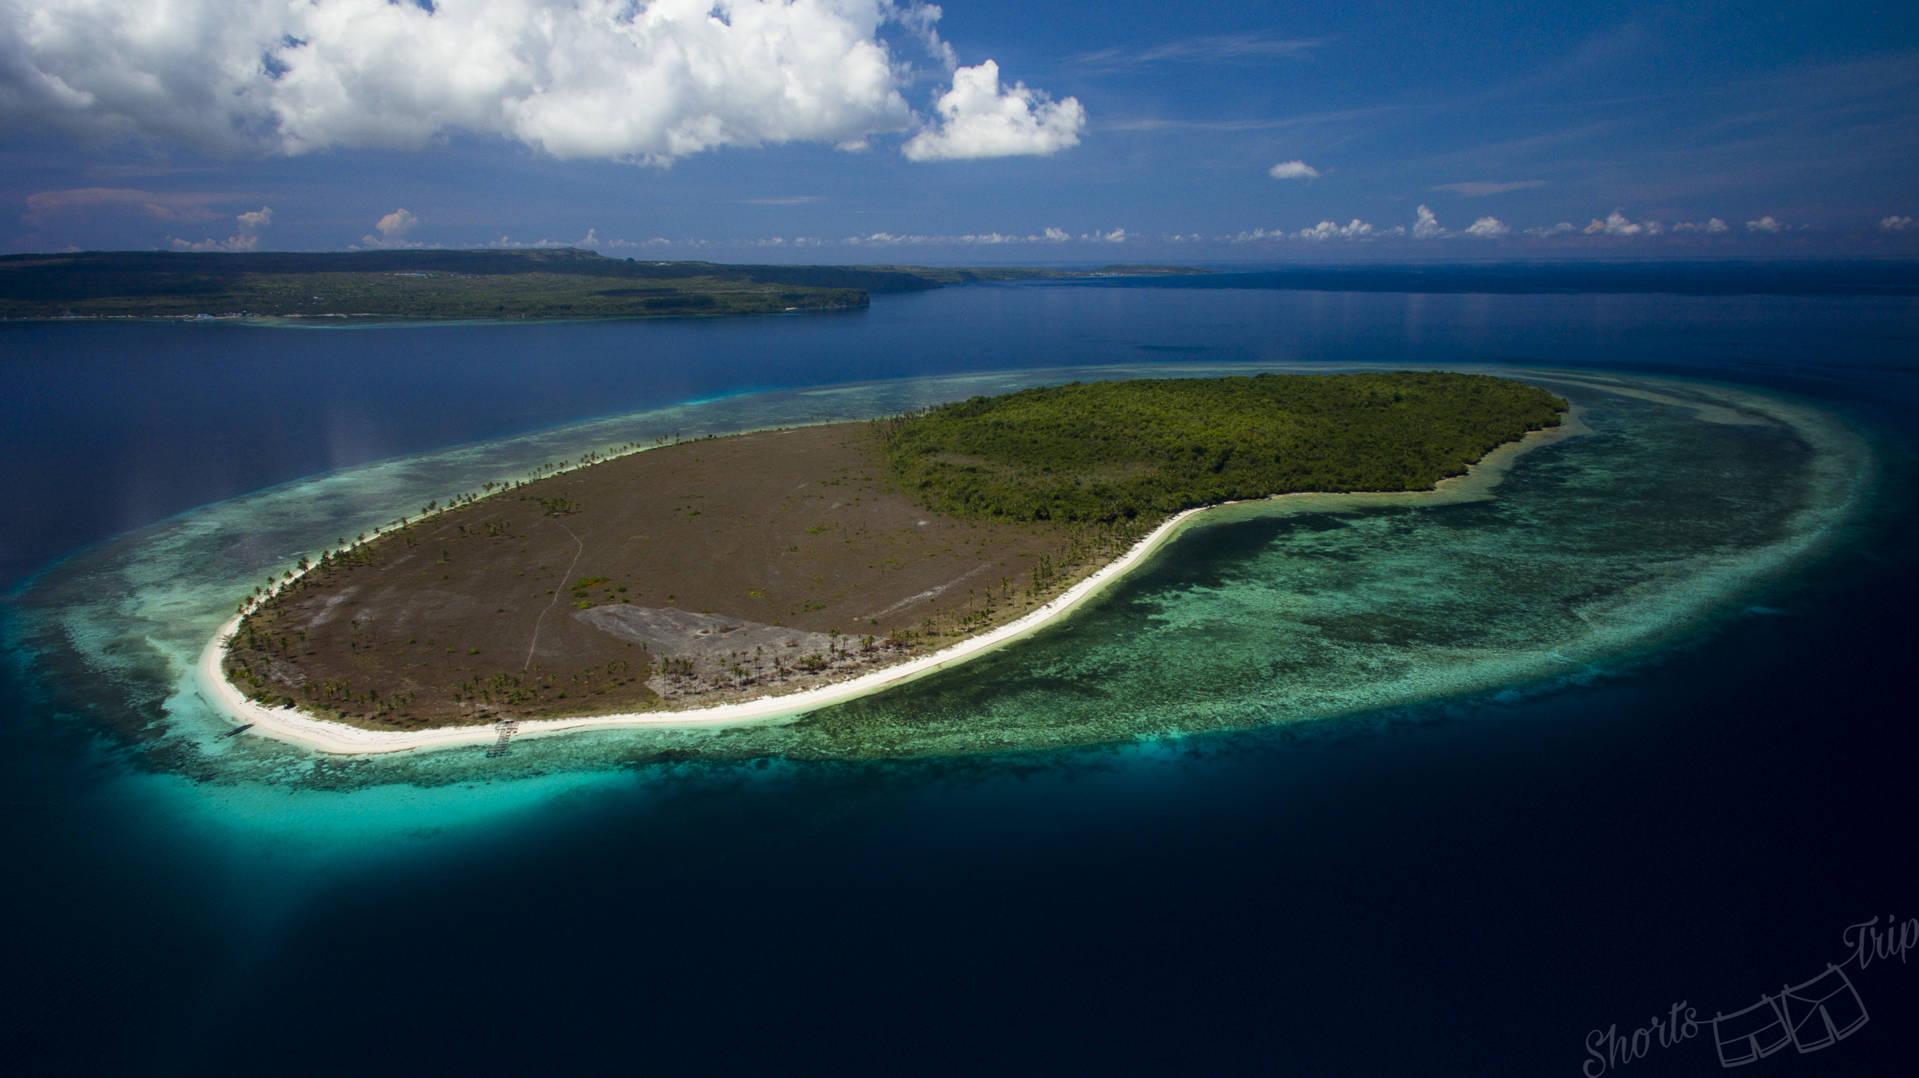 snake island bau-bau, samparona, true indonesia, real indonesia, sulawesi out of beaten path, uninhabitat island indonesia